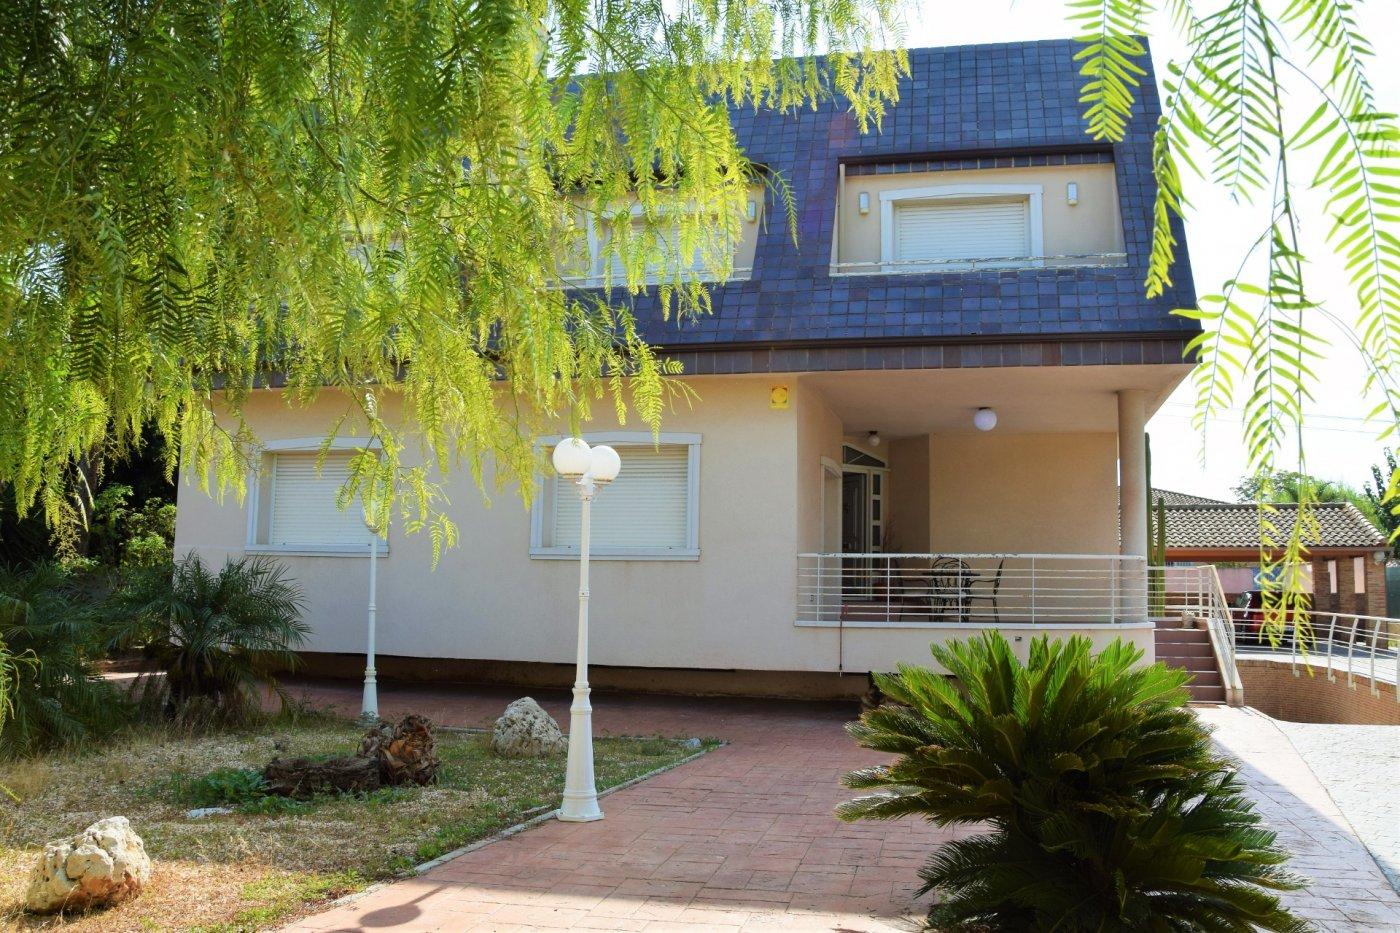 Chalet en Murcia www.joaquincarceles.com JC174 (48)